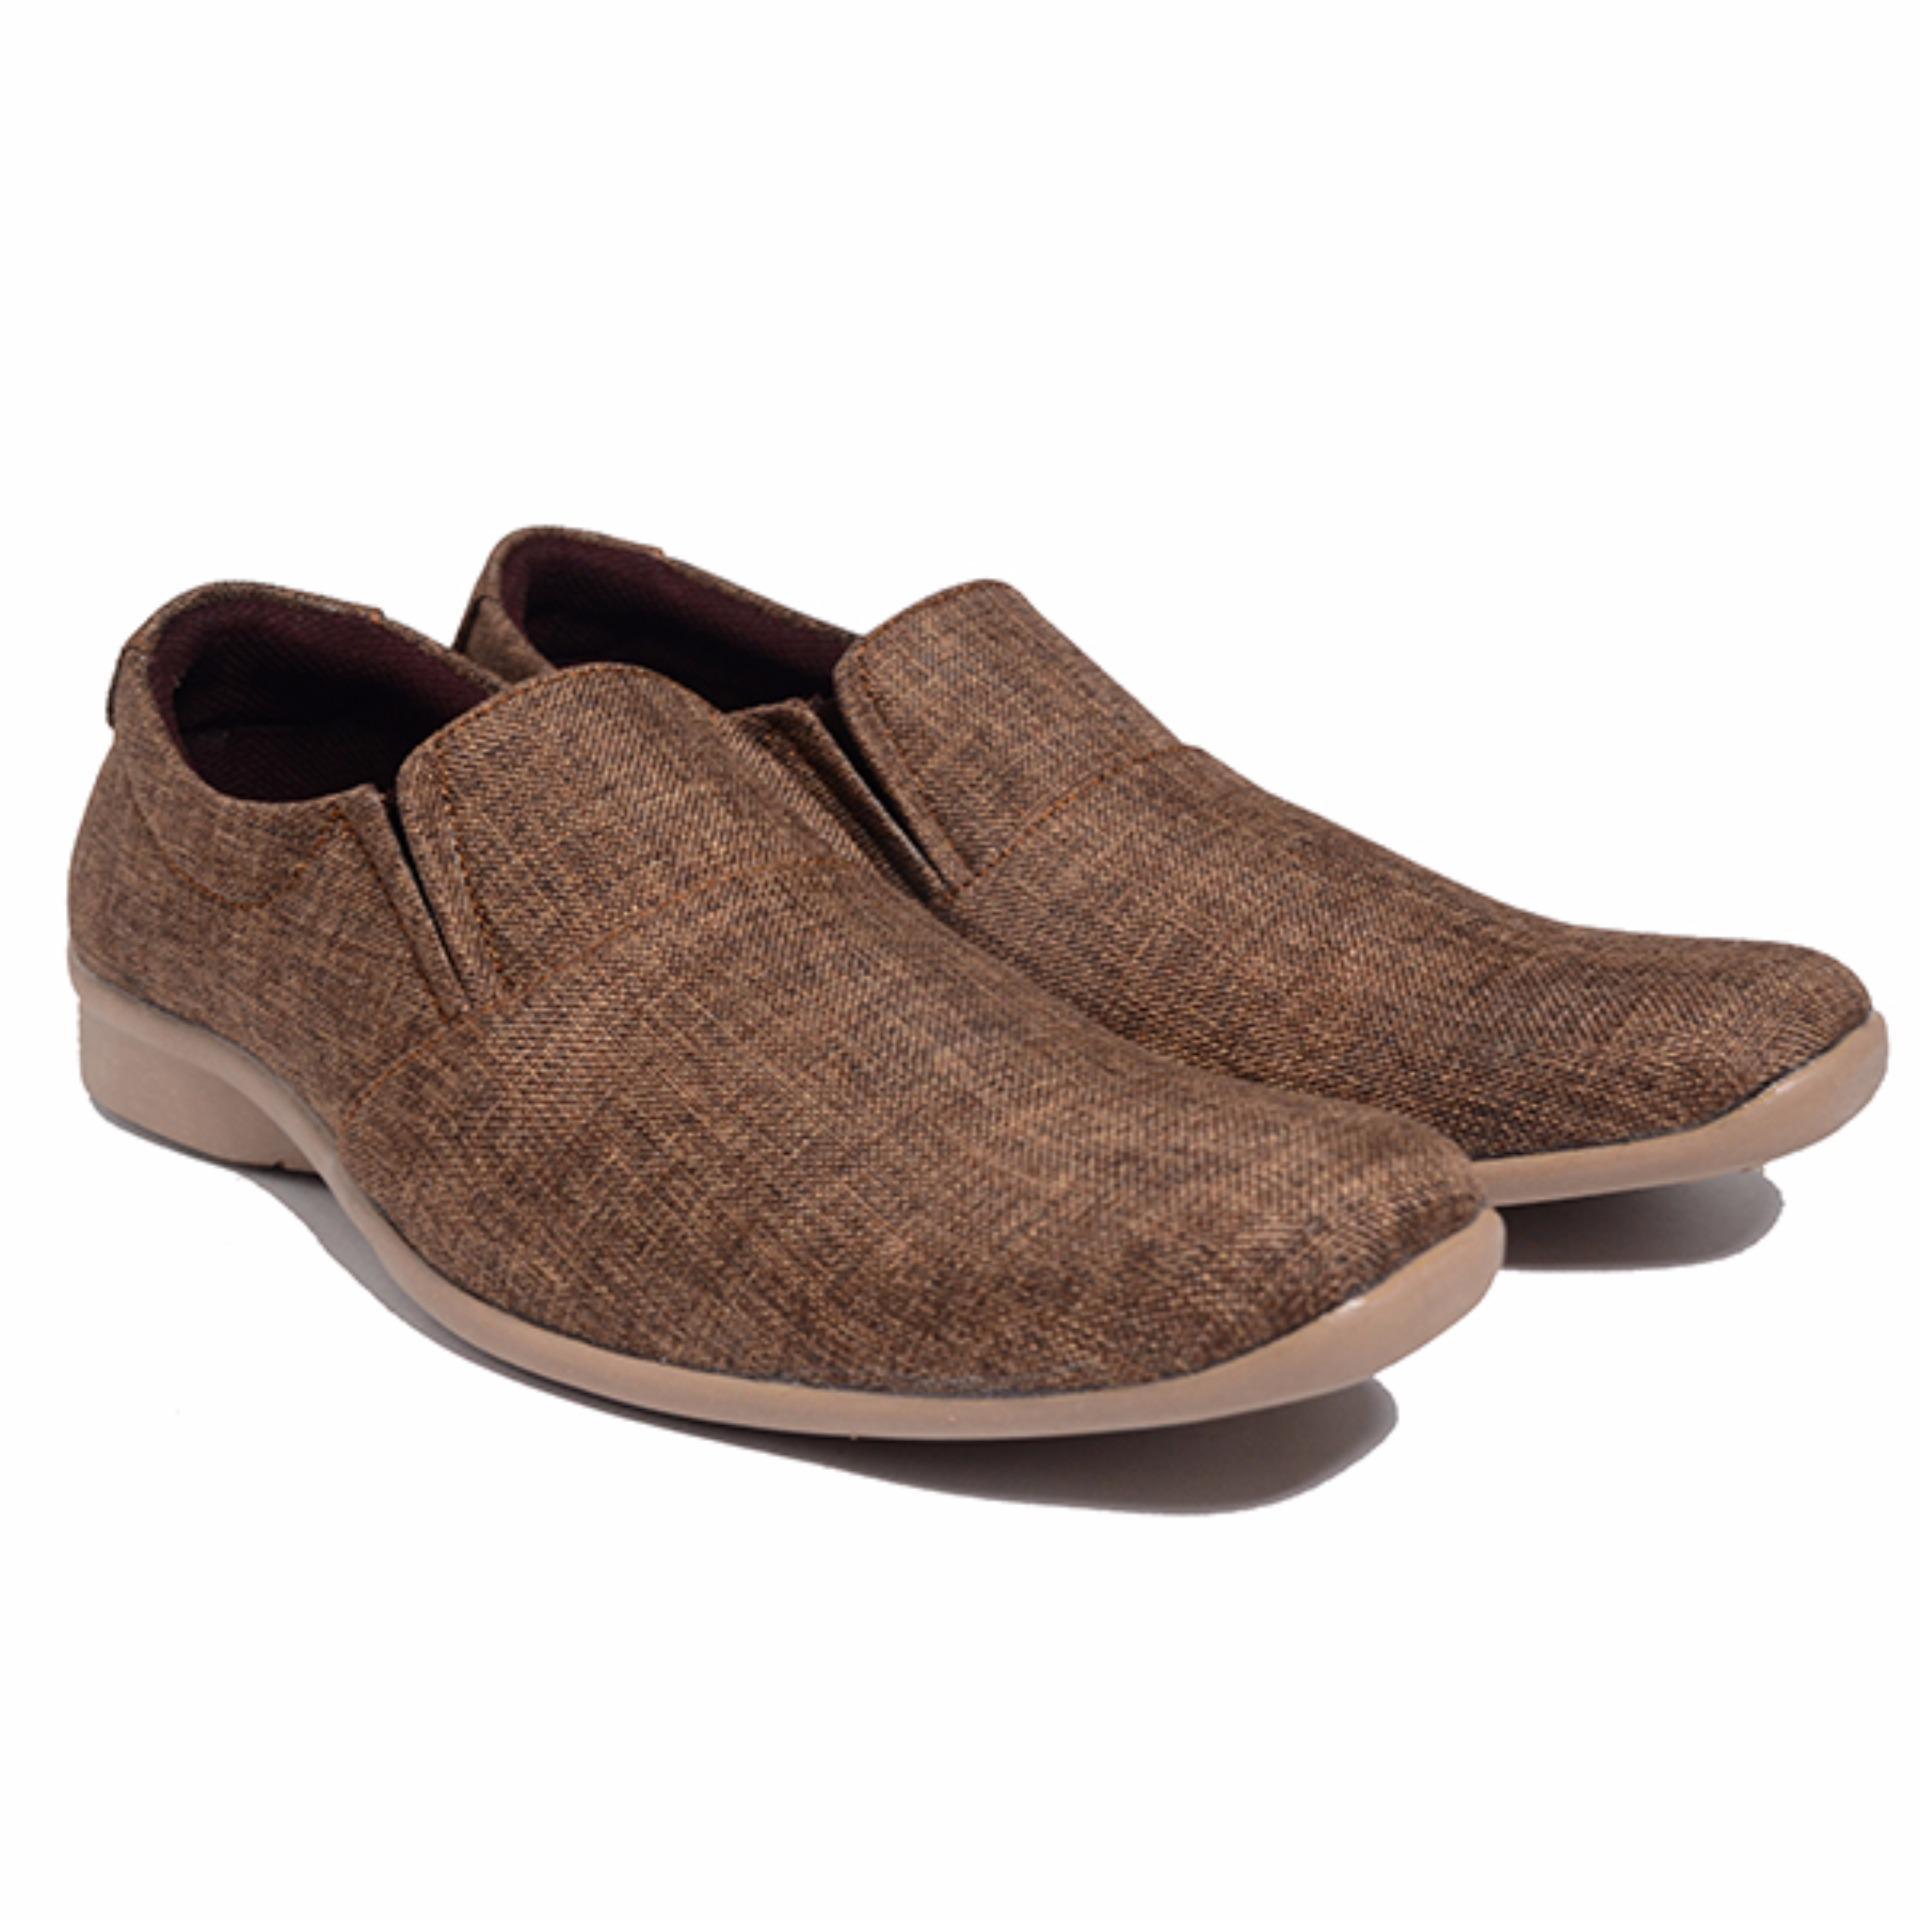 DR KEVIN SHOES - Sepatu Kasual Pria 13286 - Coklat